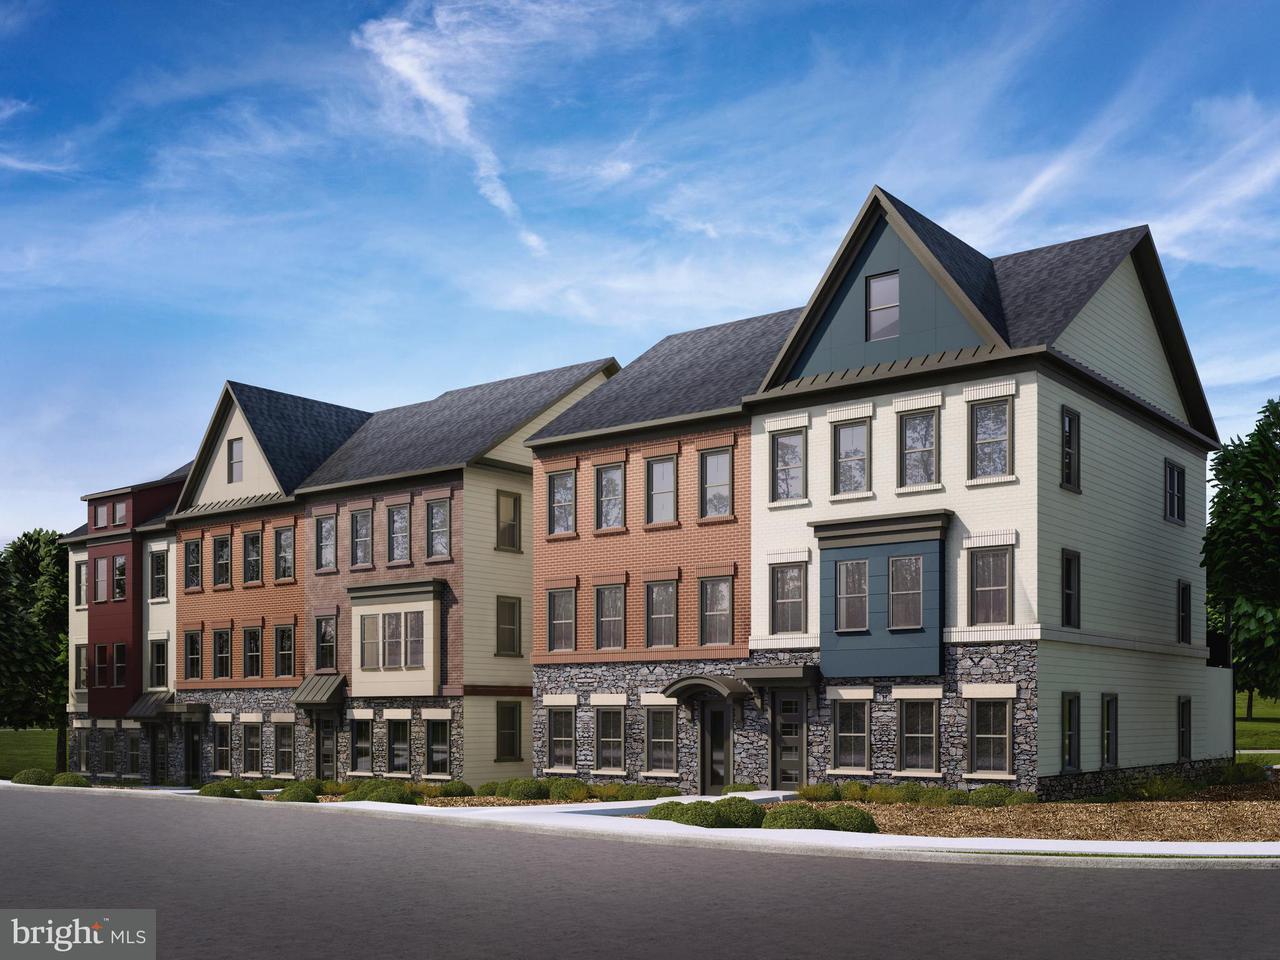 Townhouse for Sale at 7832 Ashland Drive 7832 Ashland Drive Alexandria, Virginia 22315 United States